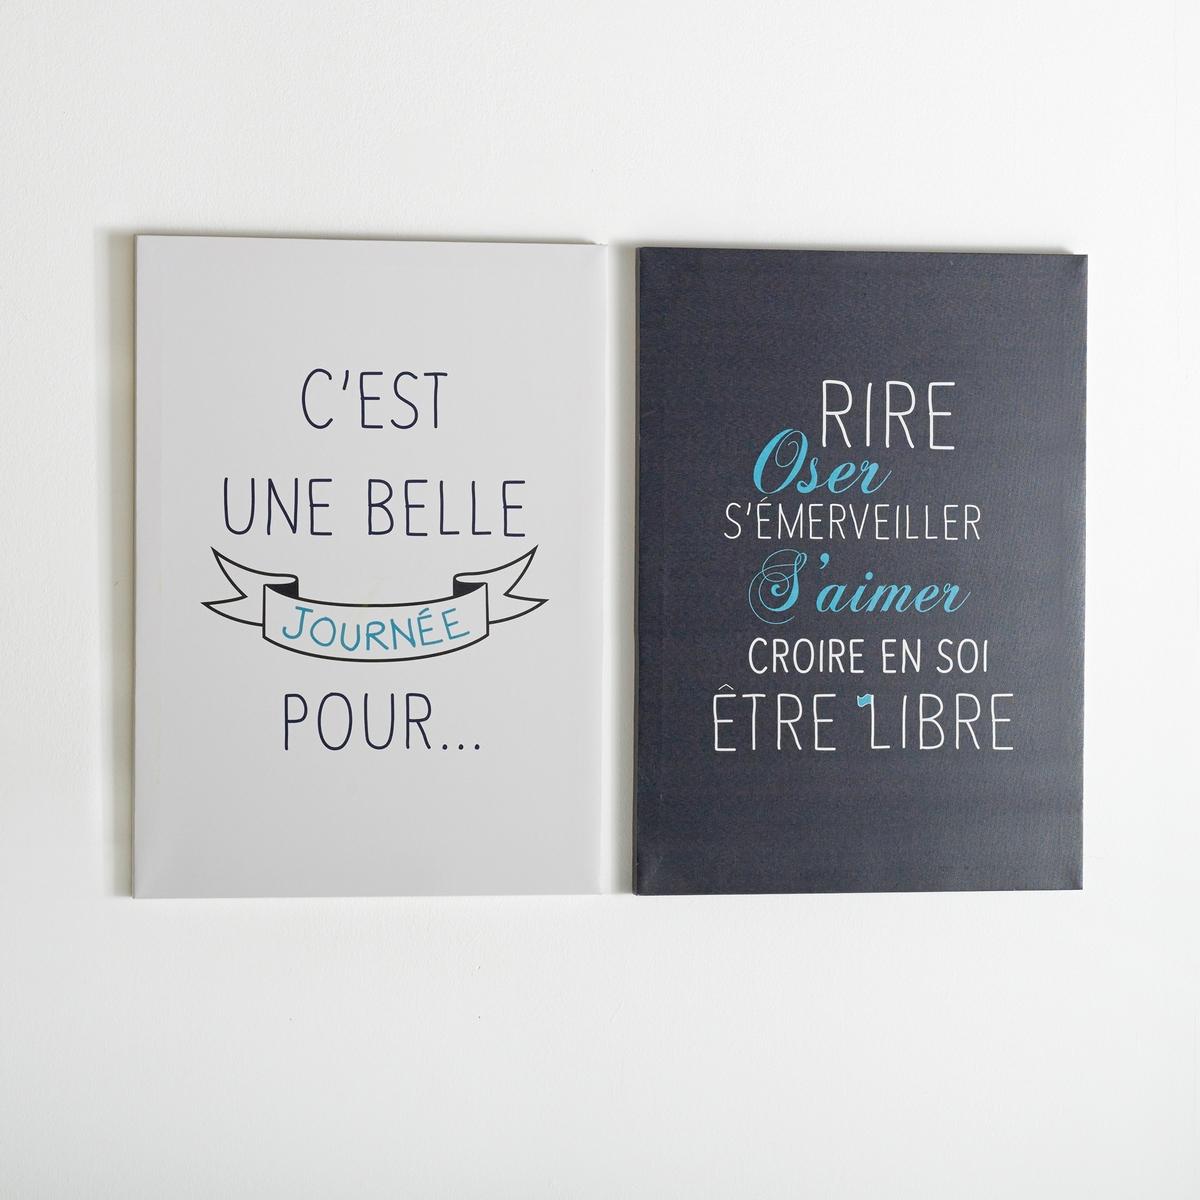 2 картины, автор - Escripto от La Redoute